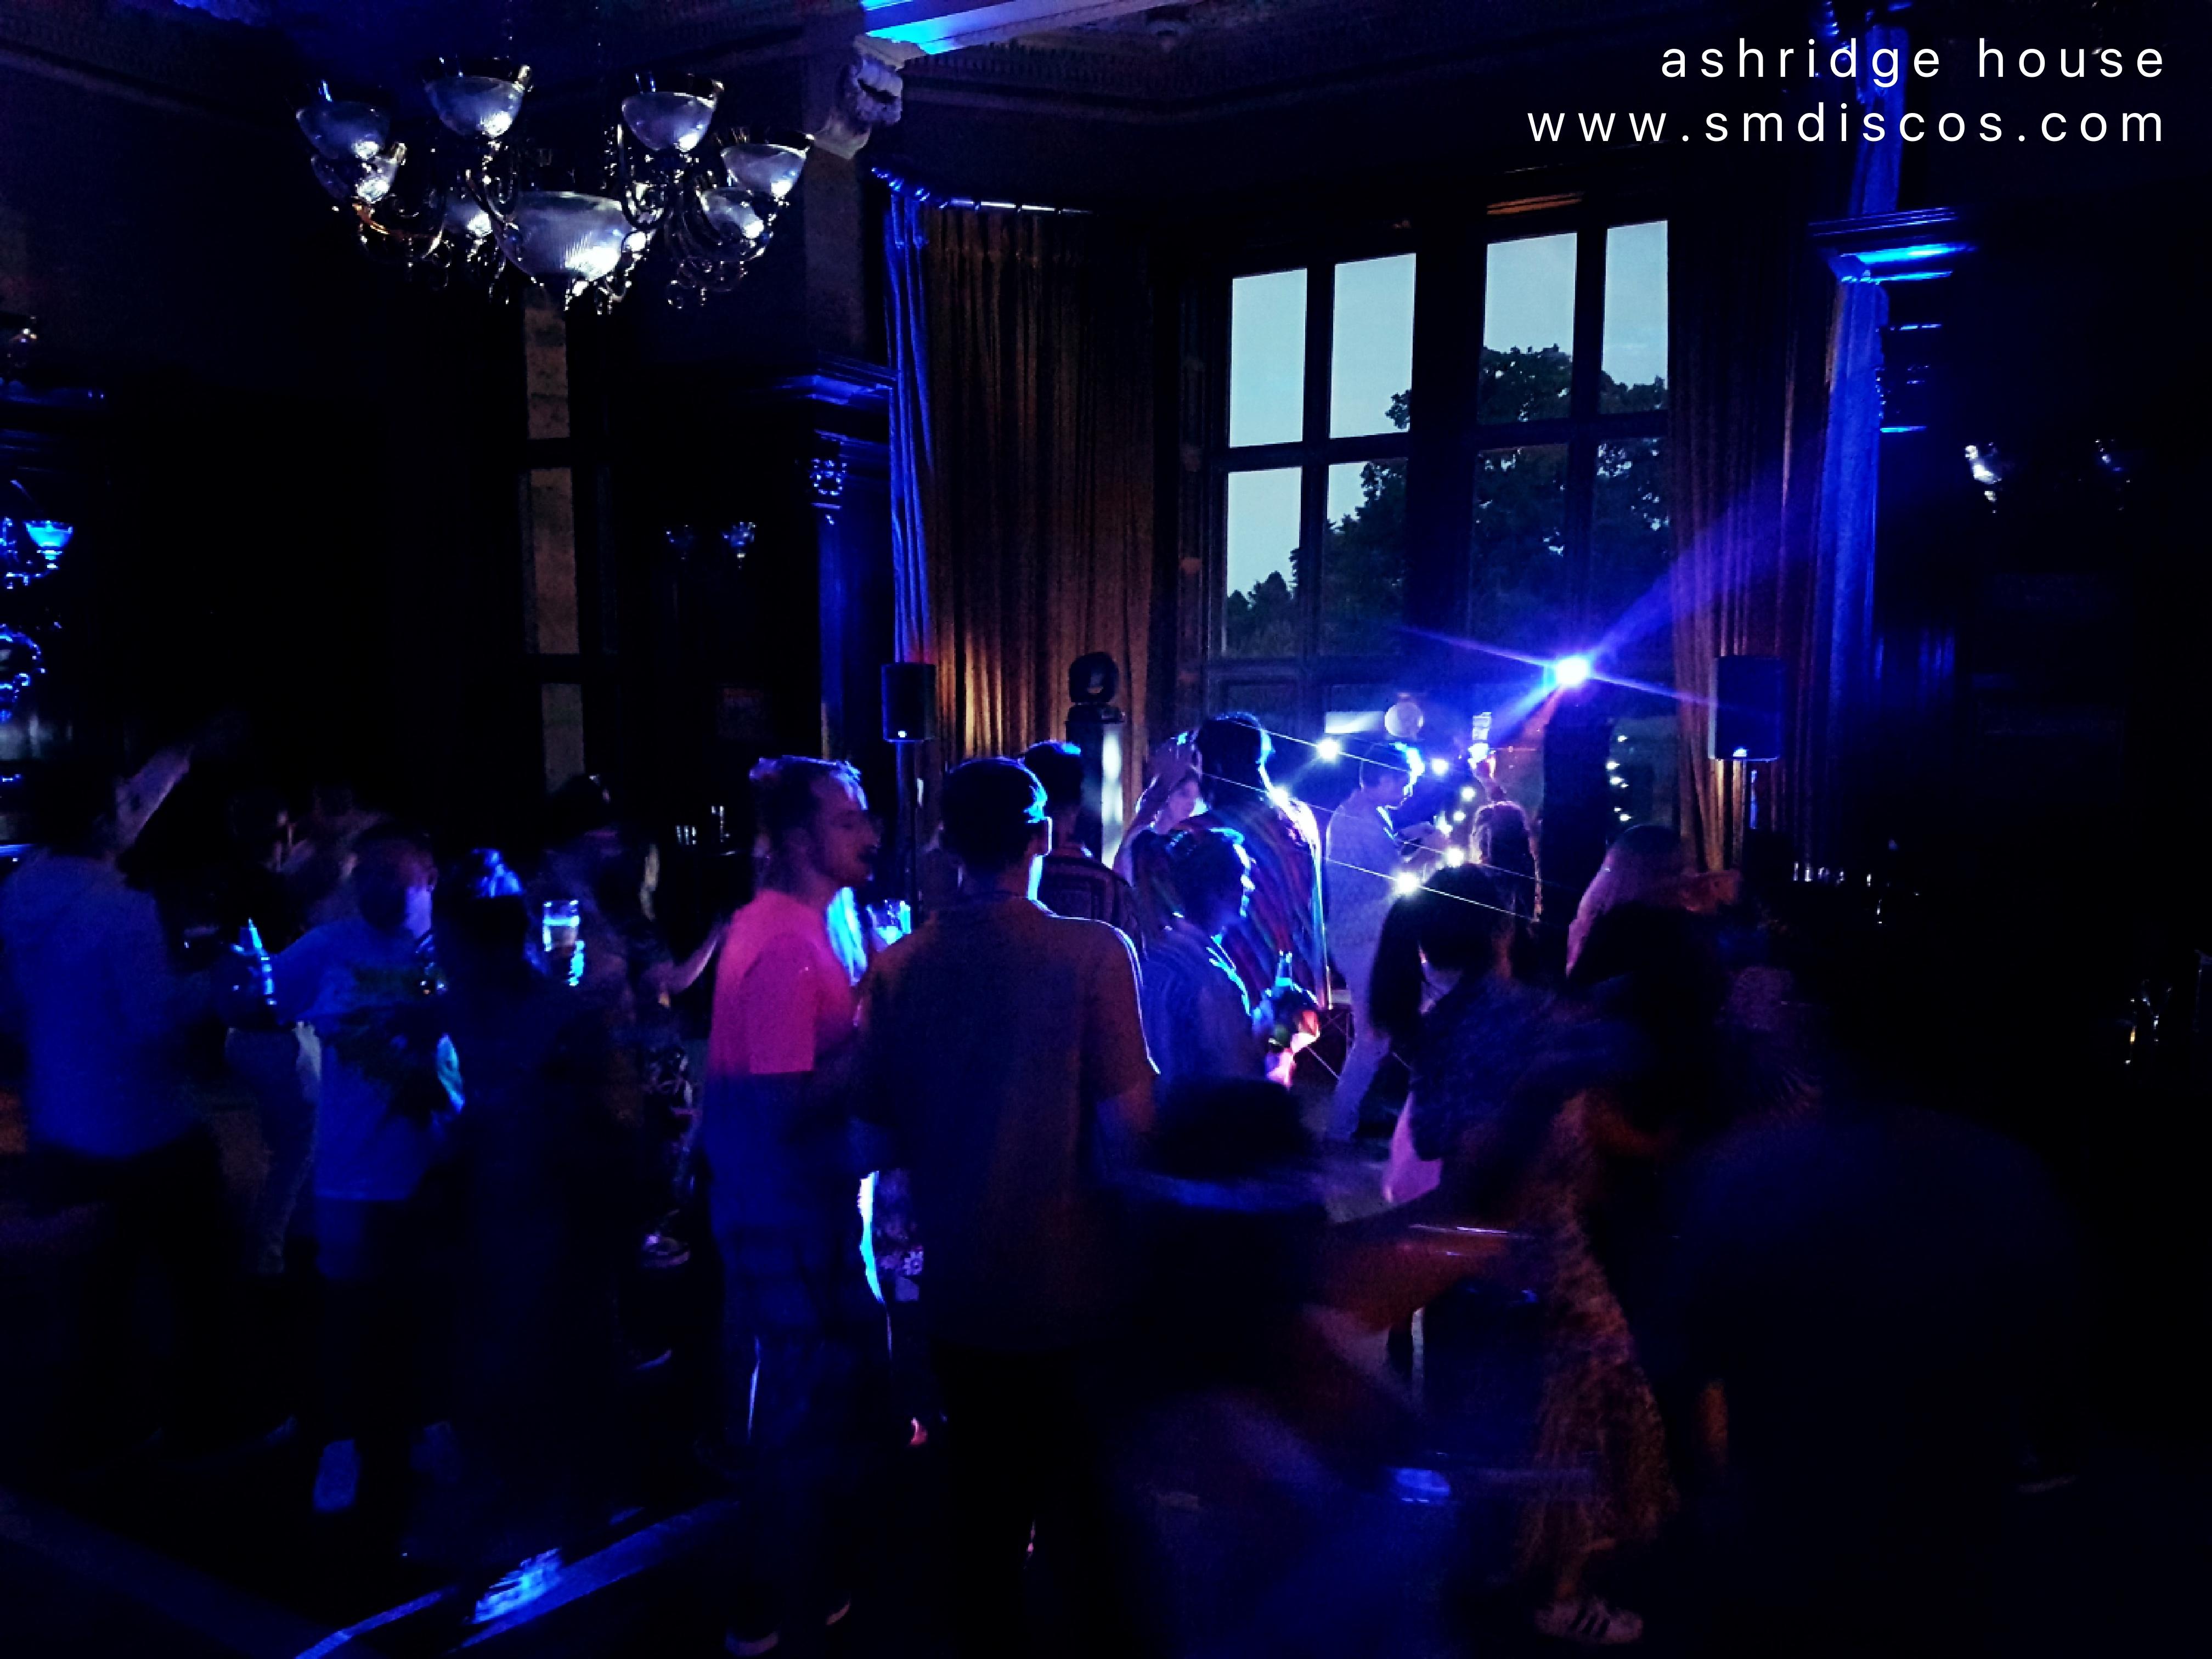 the dancefloor at ashridge house